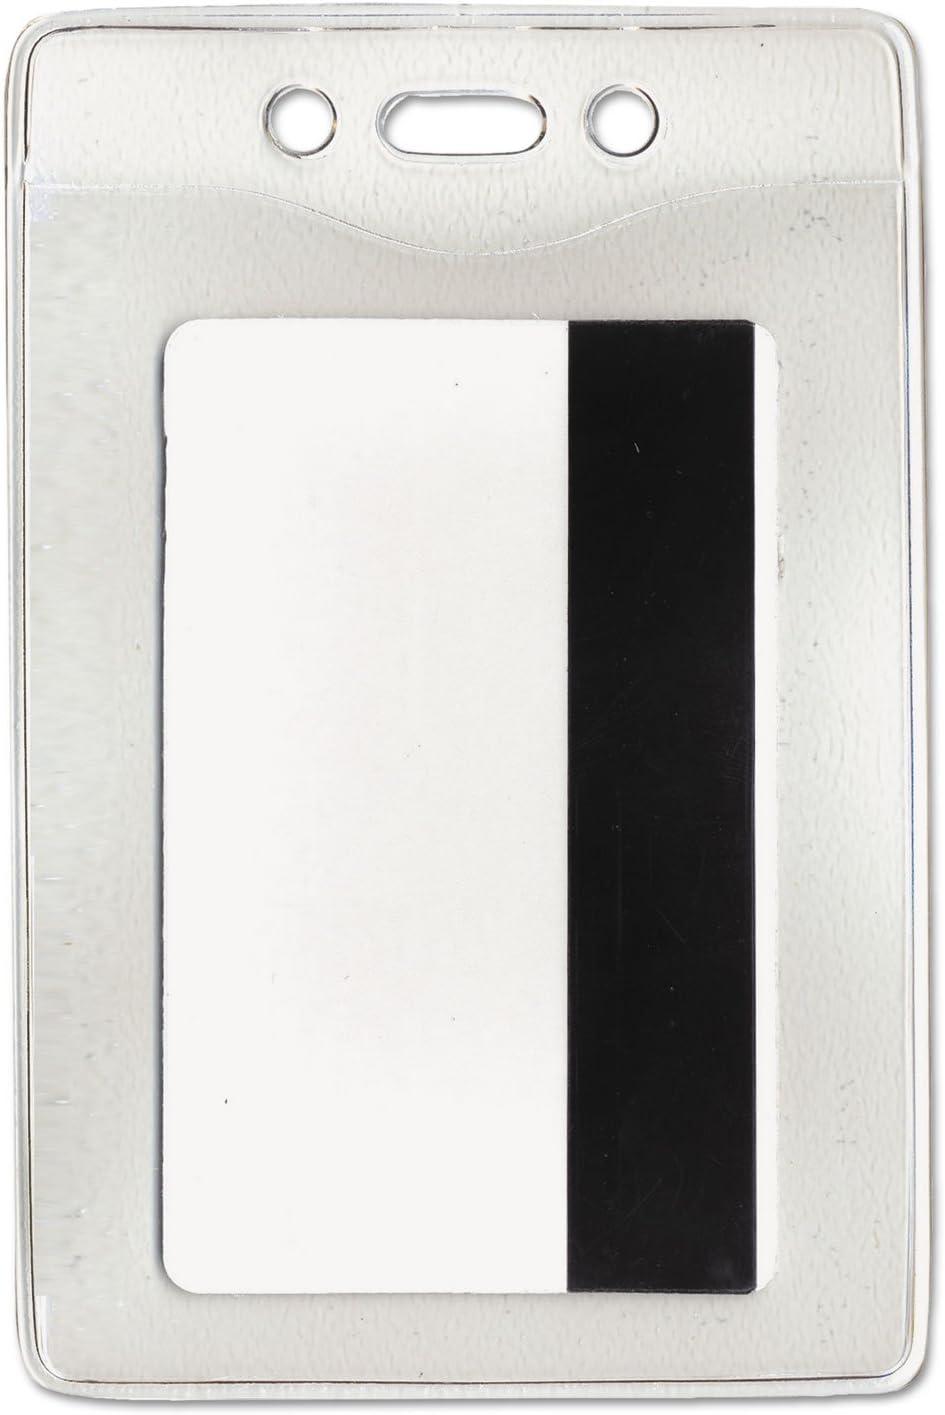 AVT75419 - Under blast sales Advantus Vertical Badge Rare Security Holder